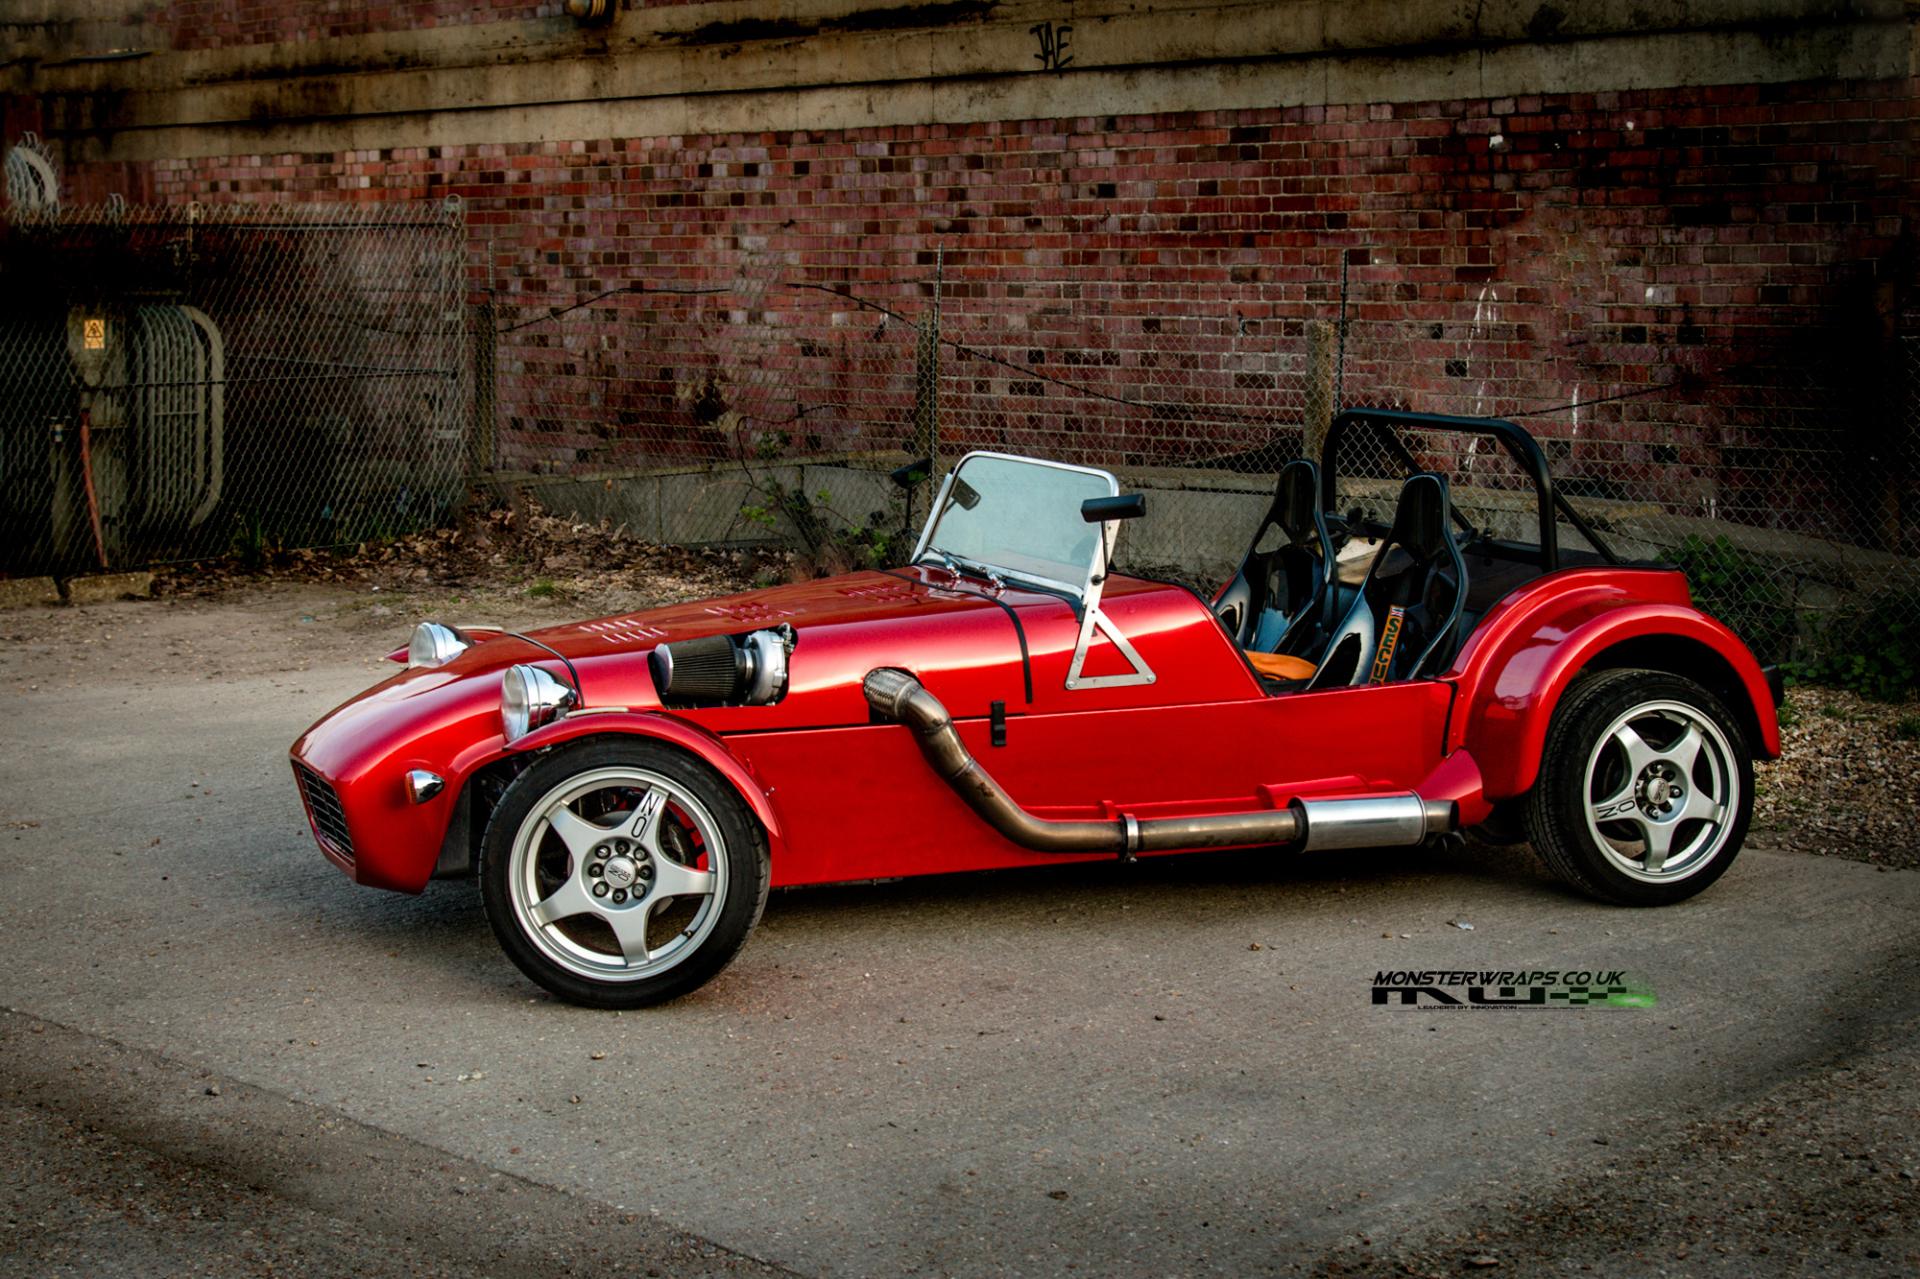 Westfield turbo kit car wrap dragon fire red 3M Monsterwraps